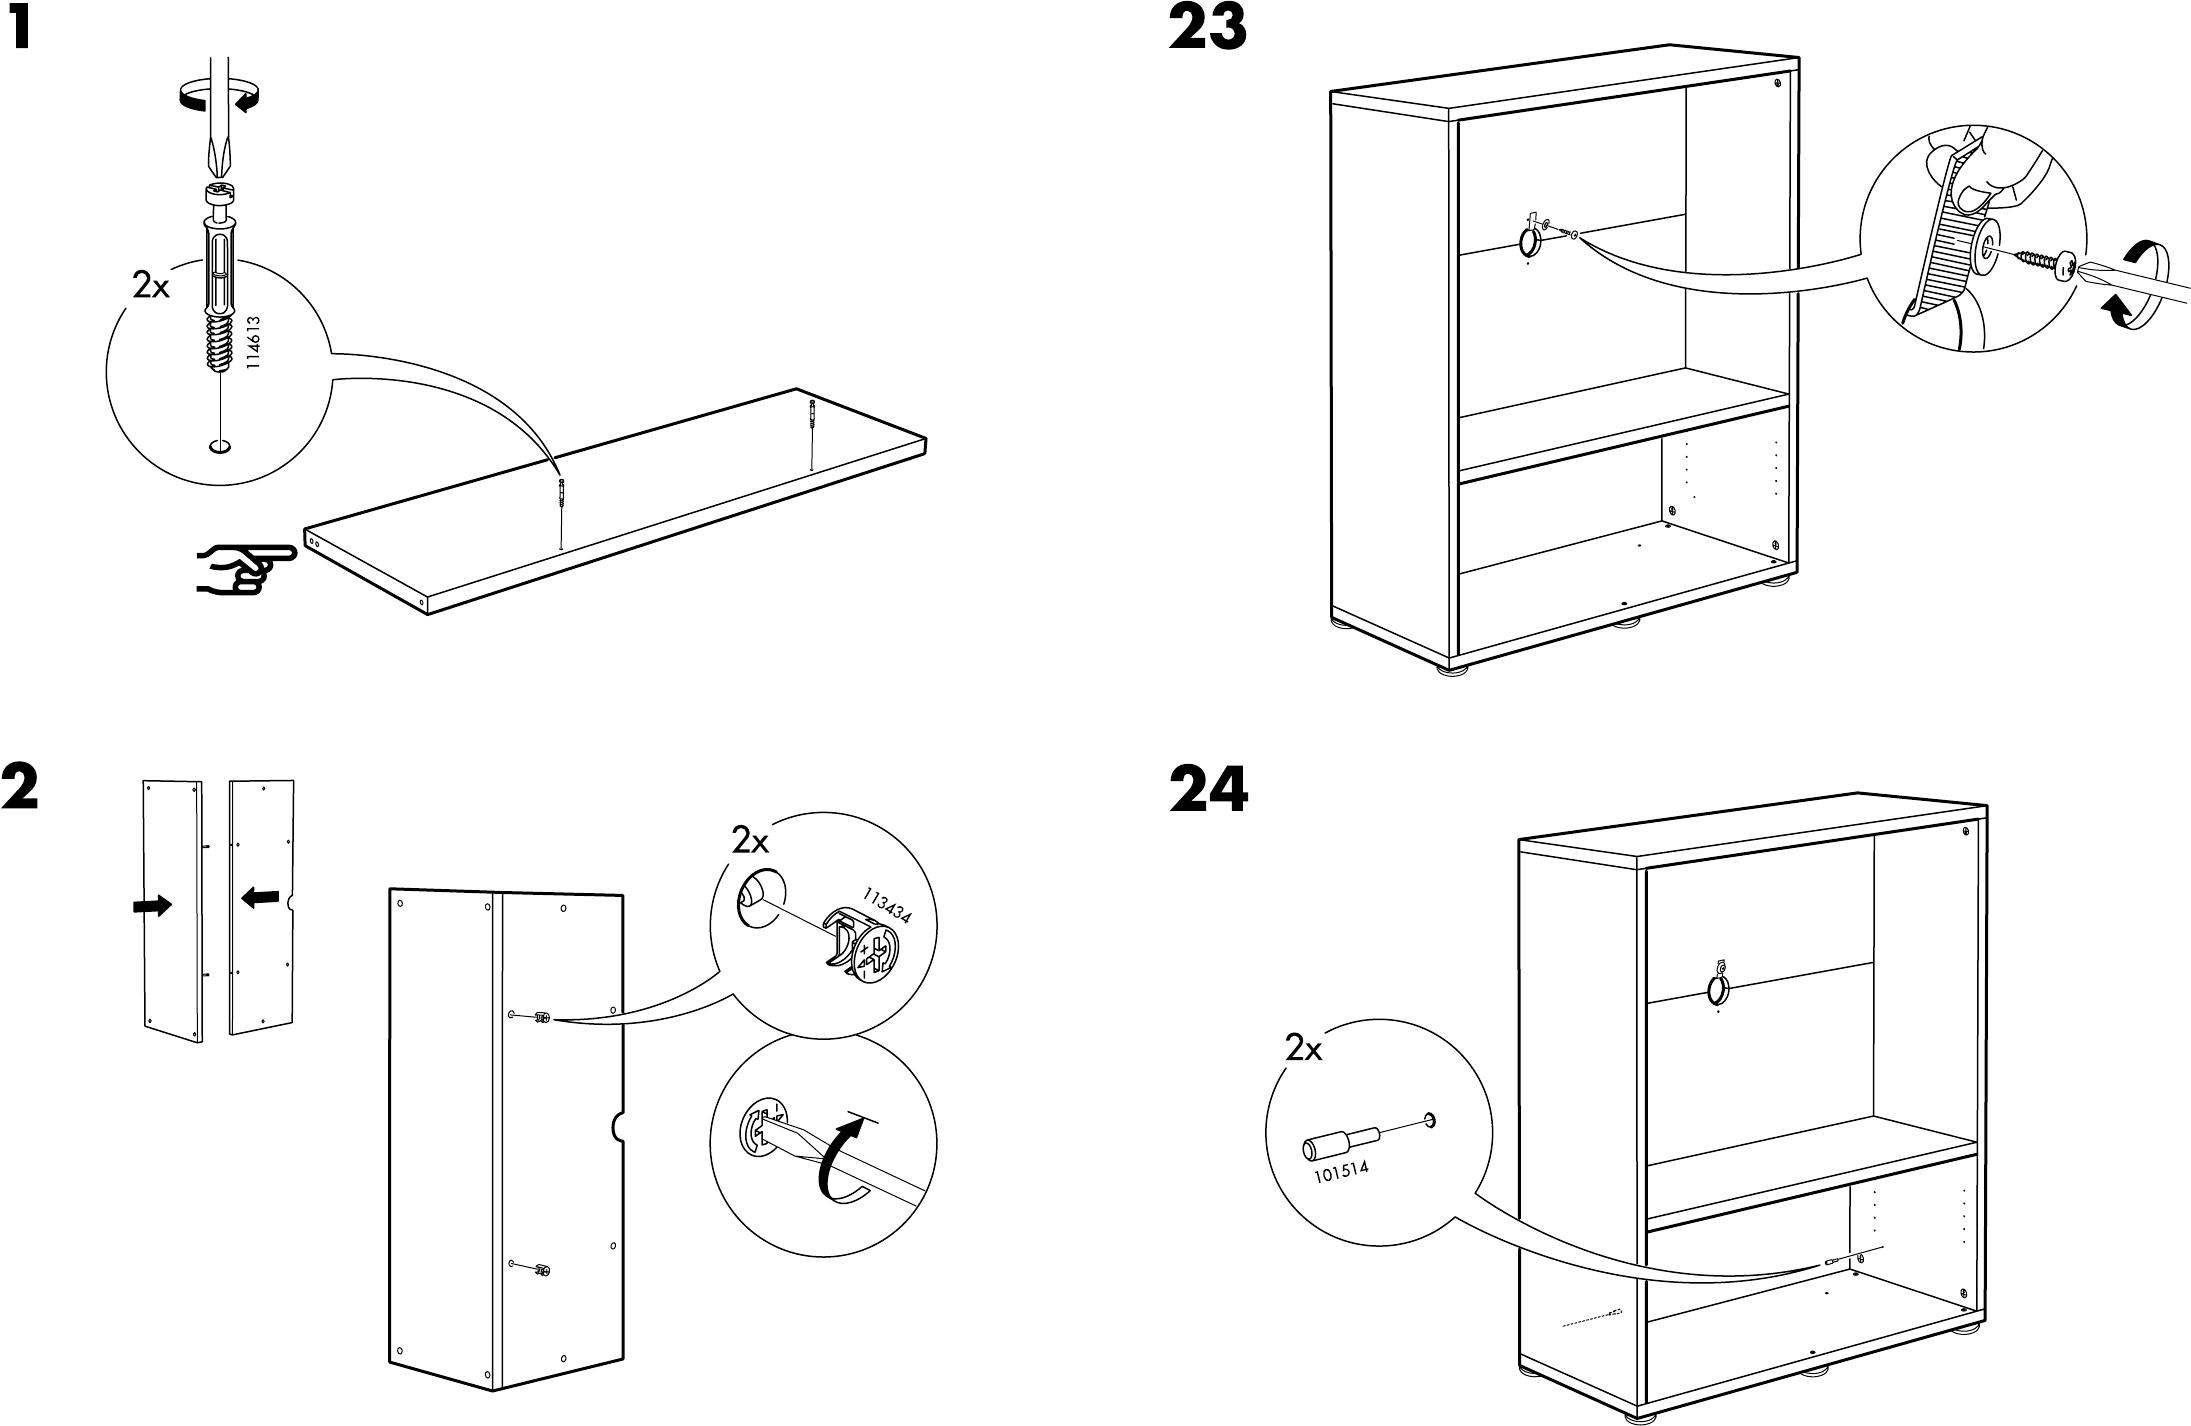 Ikea Ideas For Small Living Room ~ Handleiding Ikea Besta Enon TV kast (pagina 4 van 10) (0,68 mb Dansk